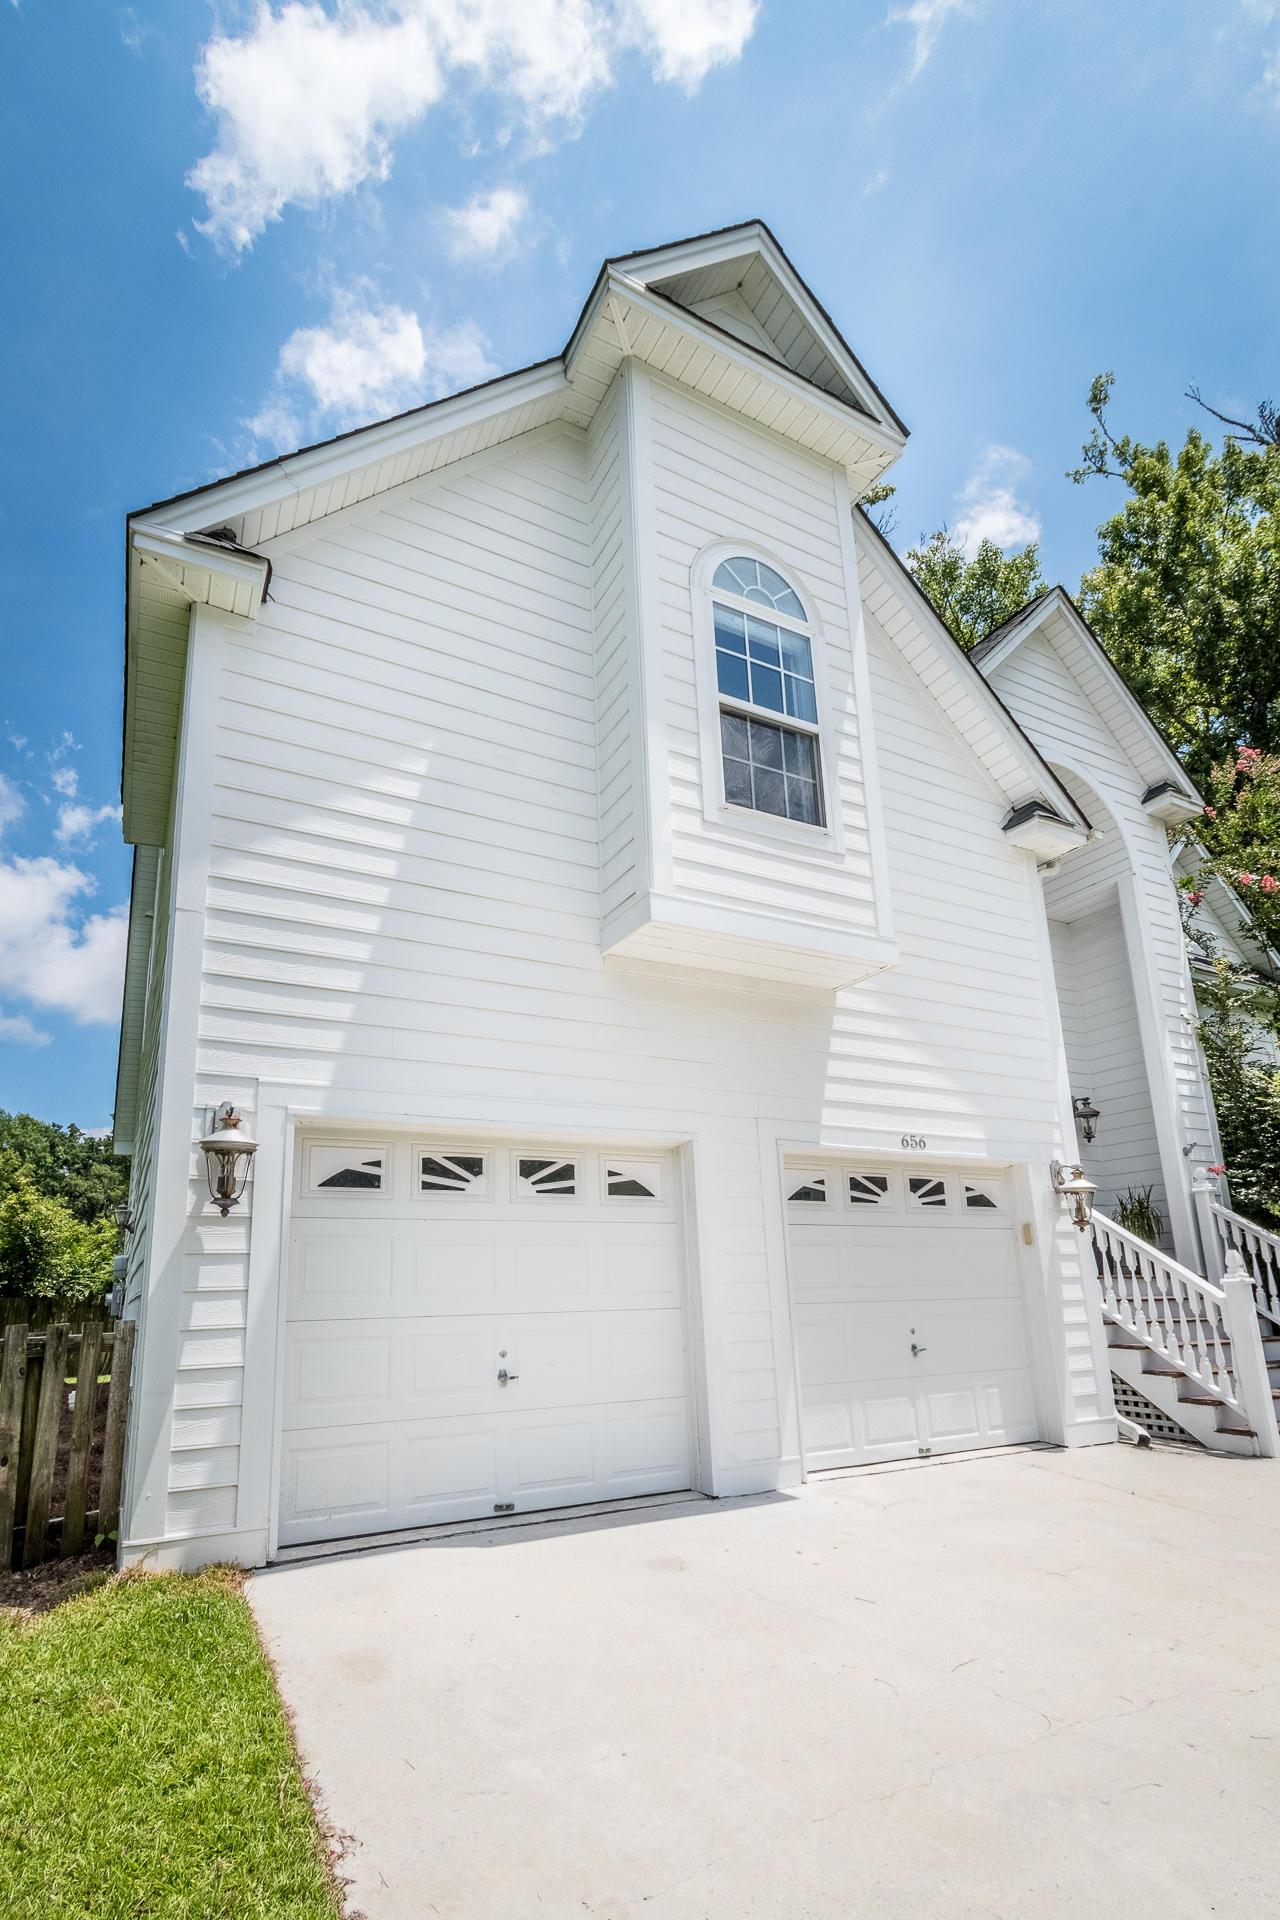 Stoneboro Shores Homes For Sale - 656 Stoneboro, Charleston, SC - 26